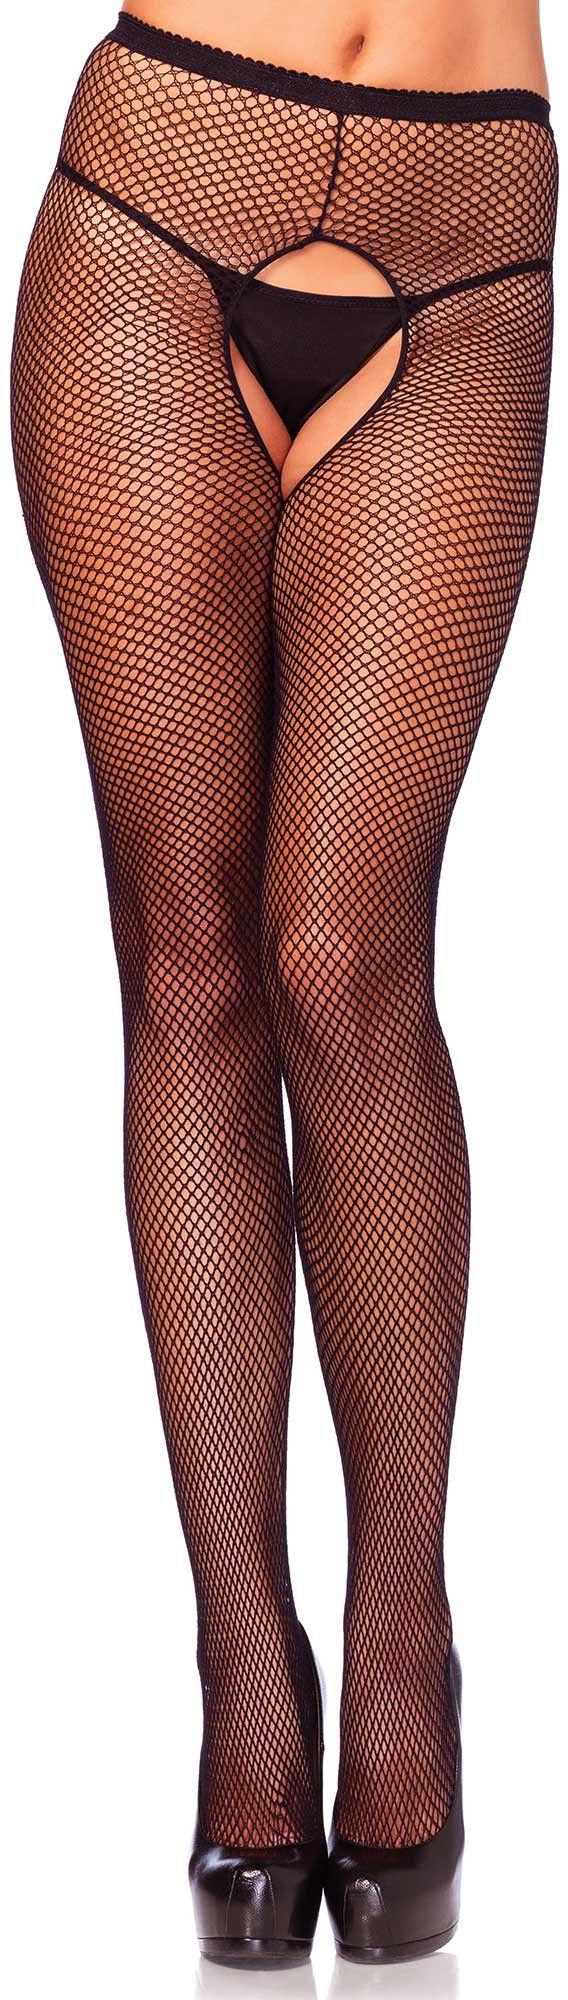 Leg Avenue Crotchless Fishnet Pantyhose 1404 Black S/M/L